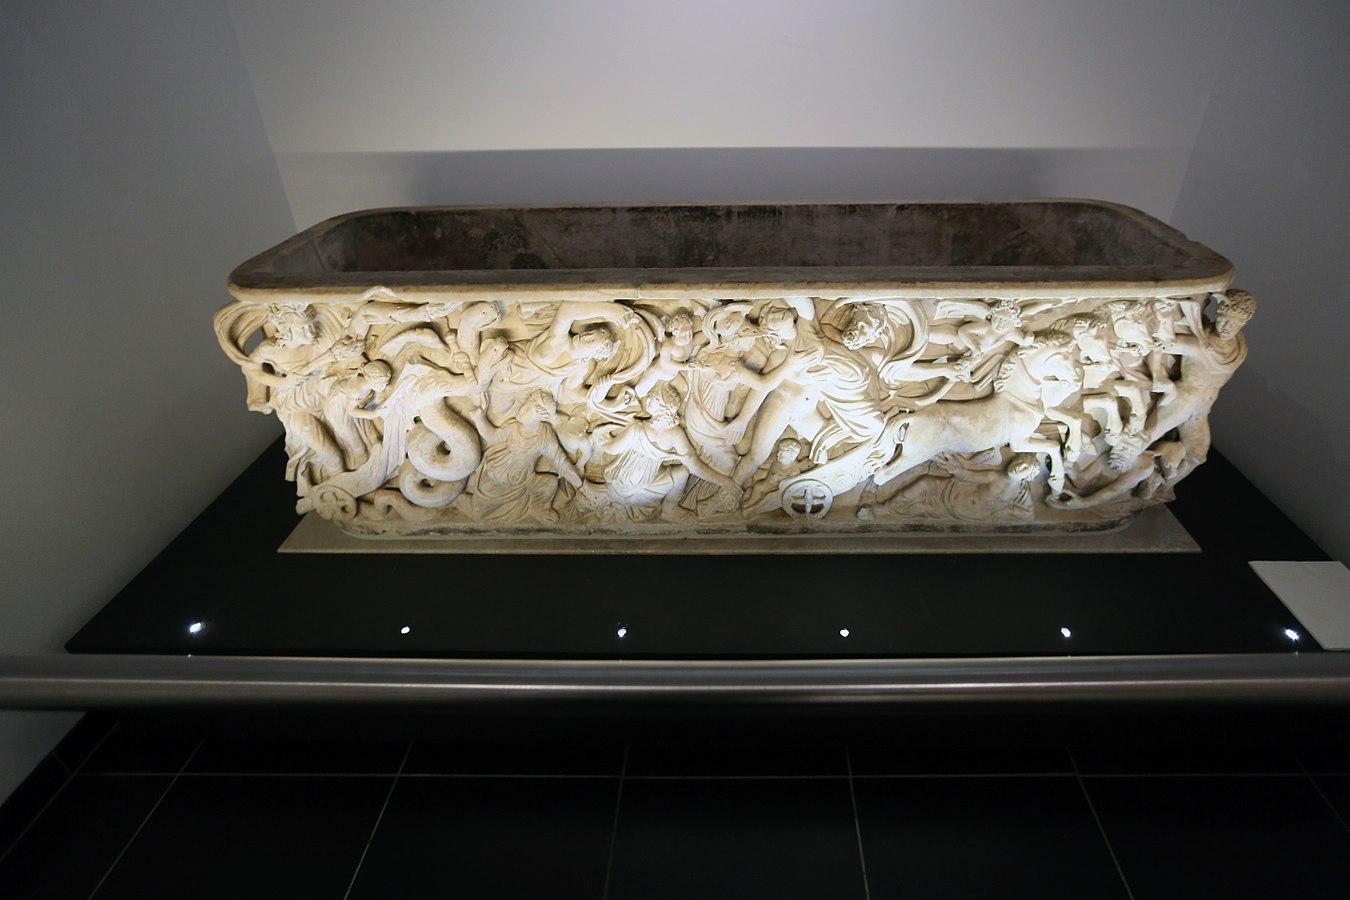 sarcophage de Proserpine